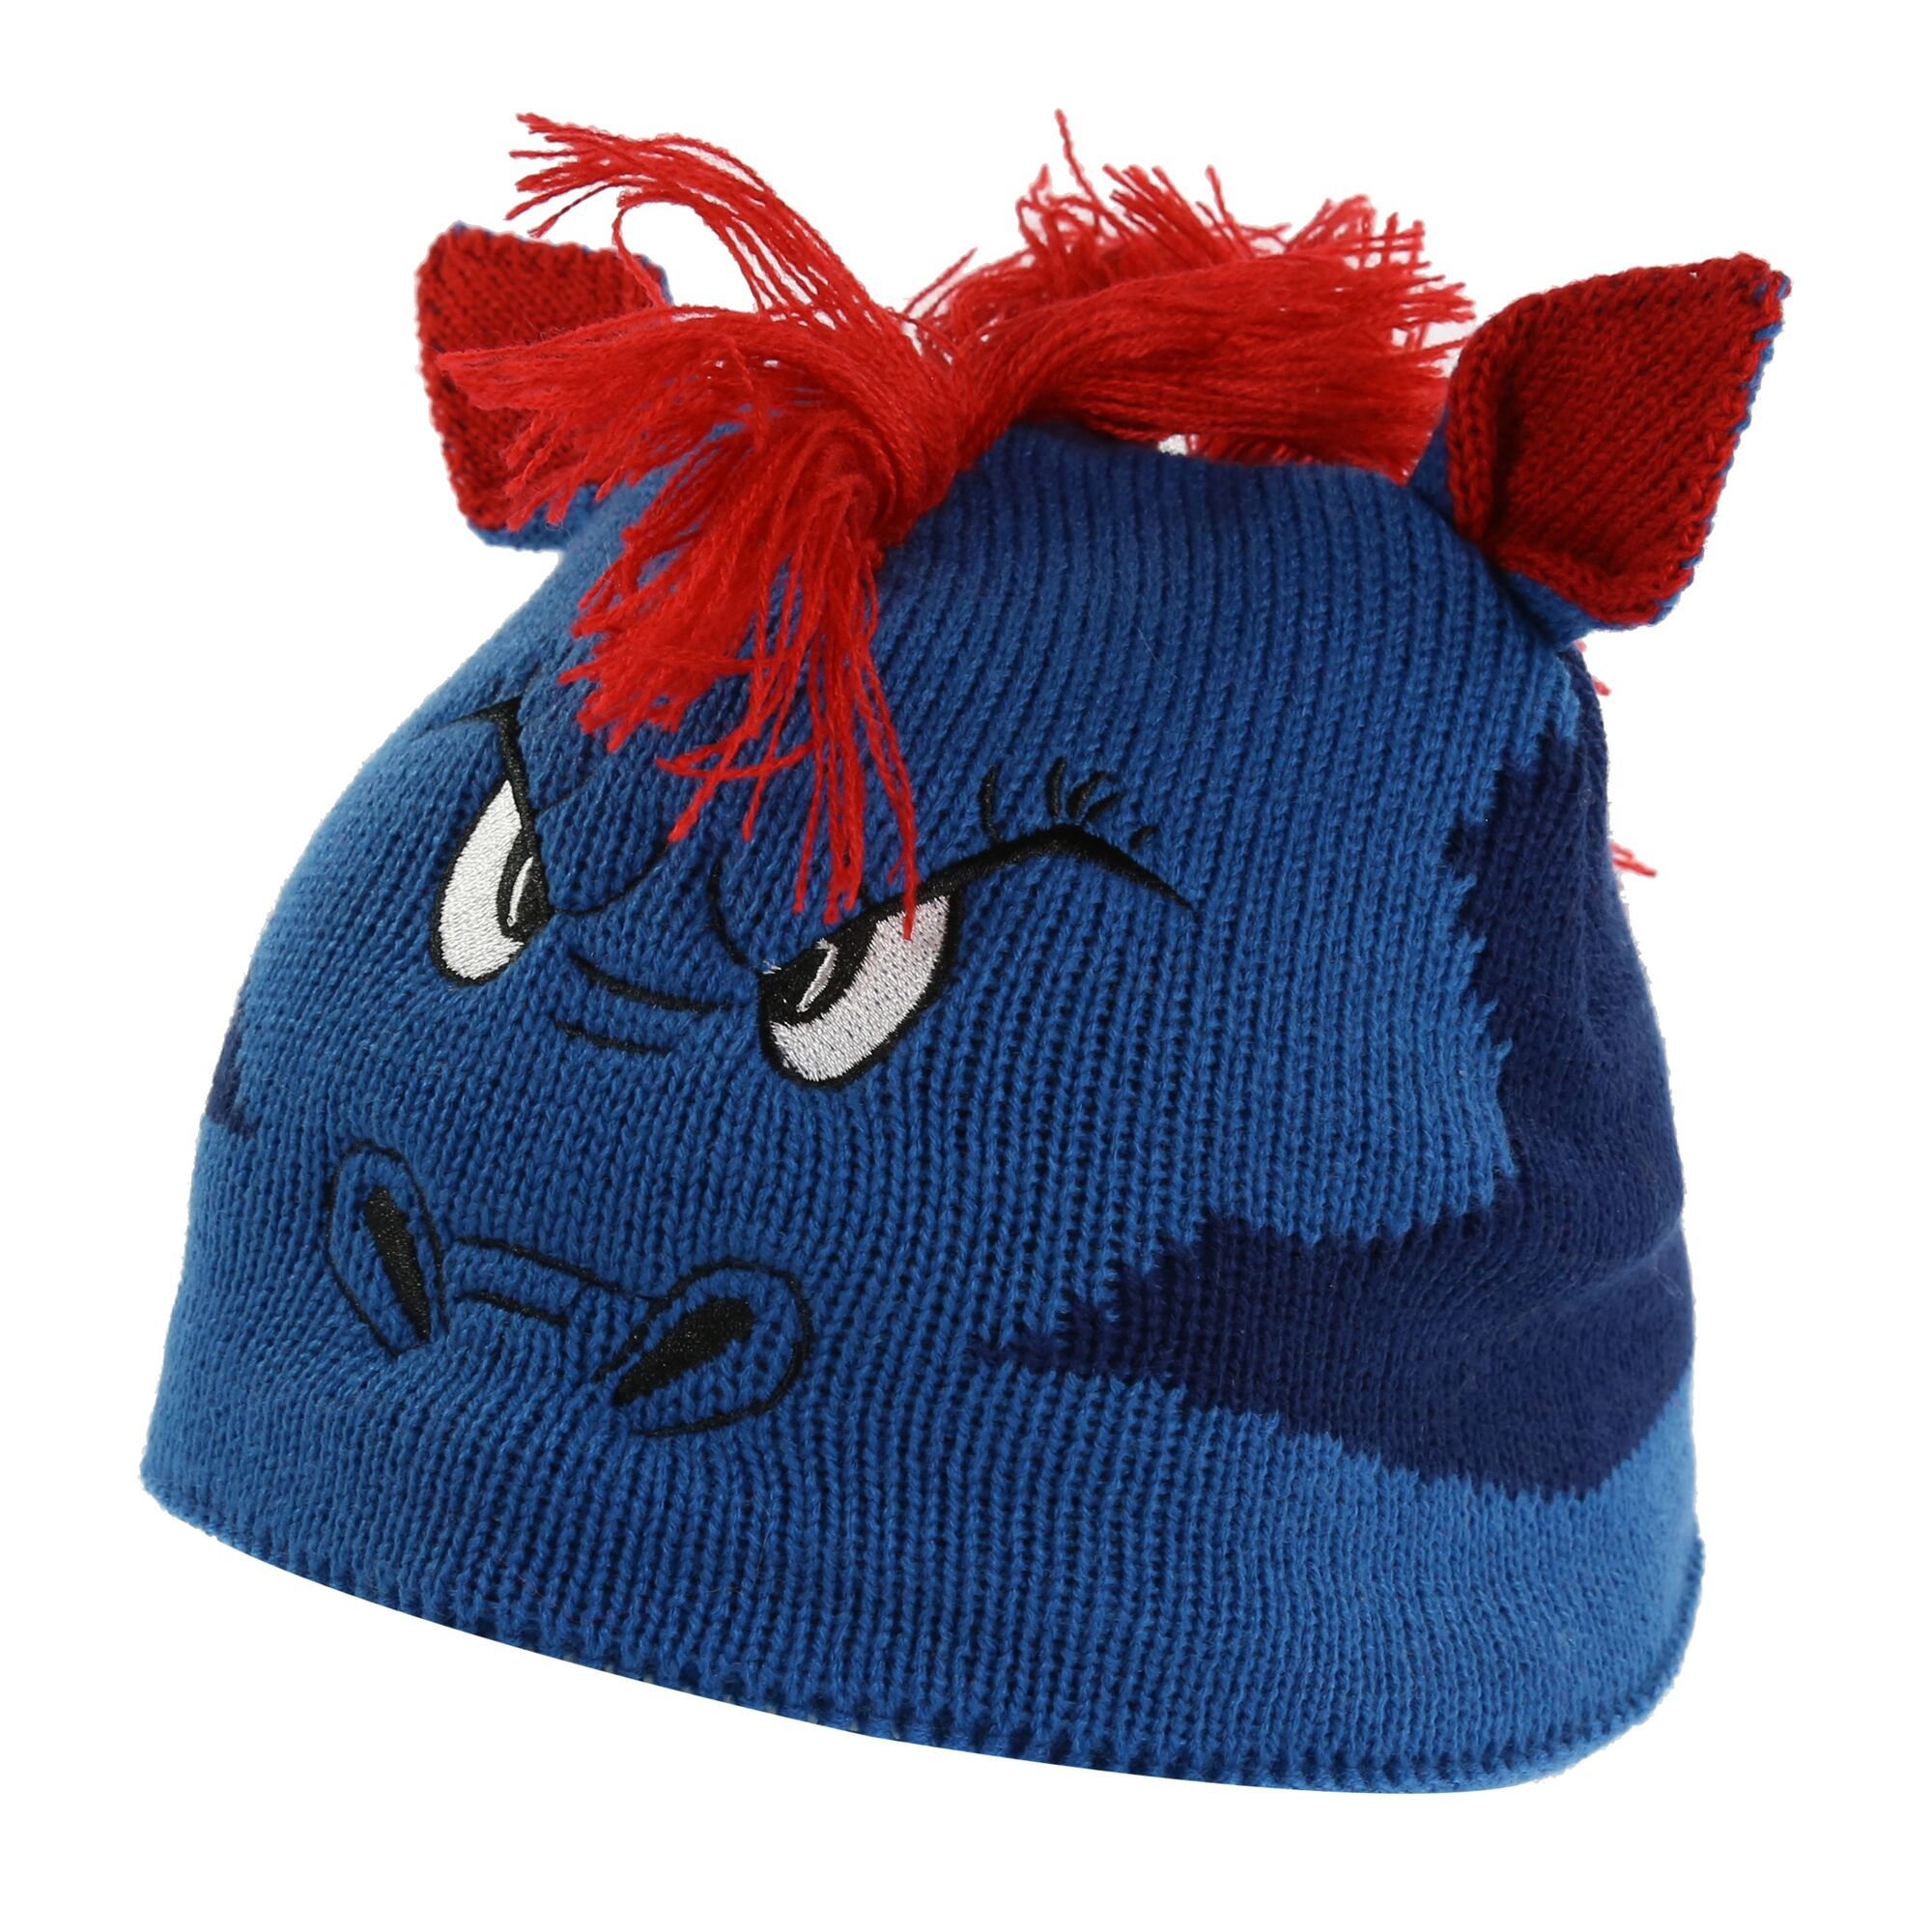 Regatta Great Outdoors Childrens/Kids Animally III Beanie Hat